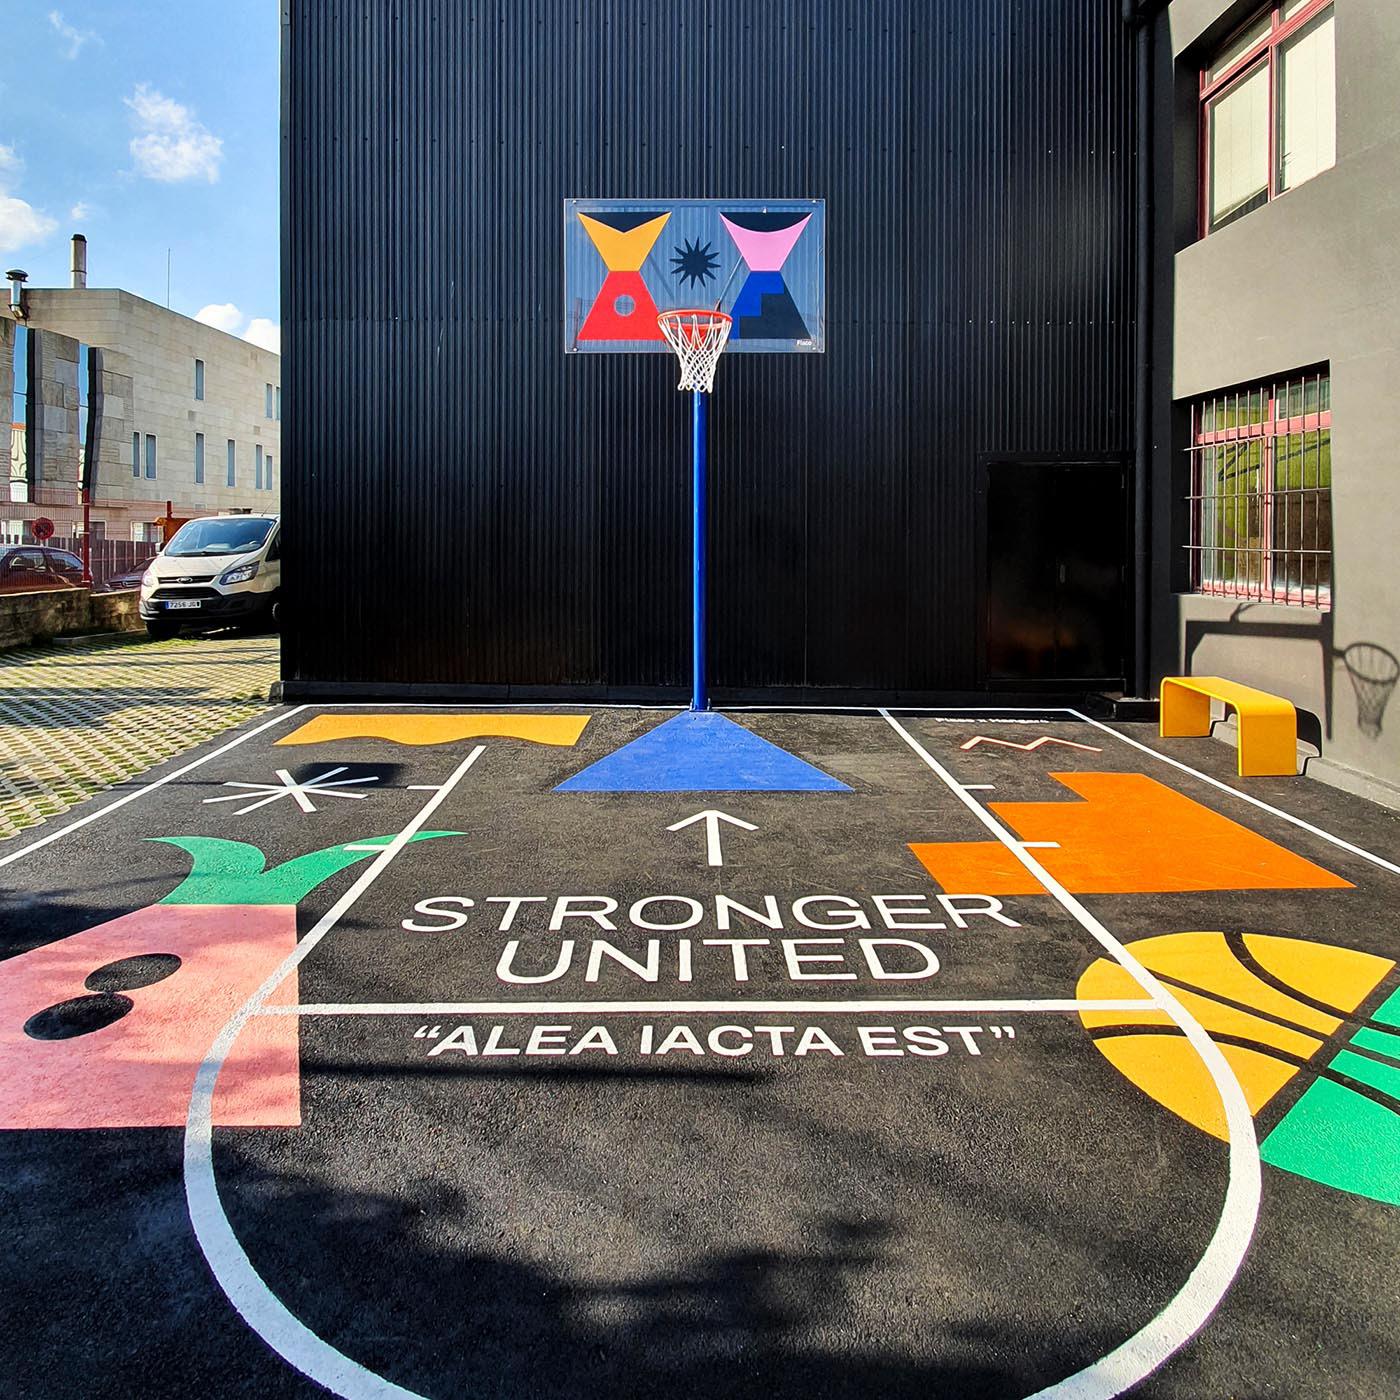 basketball,composition,court,geometry,Graffiti,Layout,NBA,shapes,streetart,Stronger united